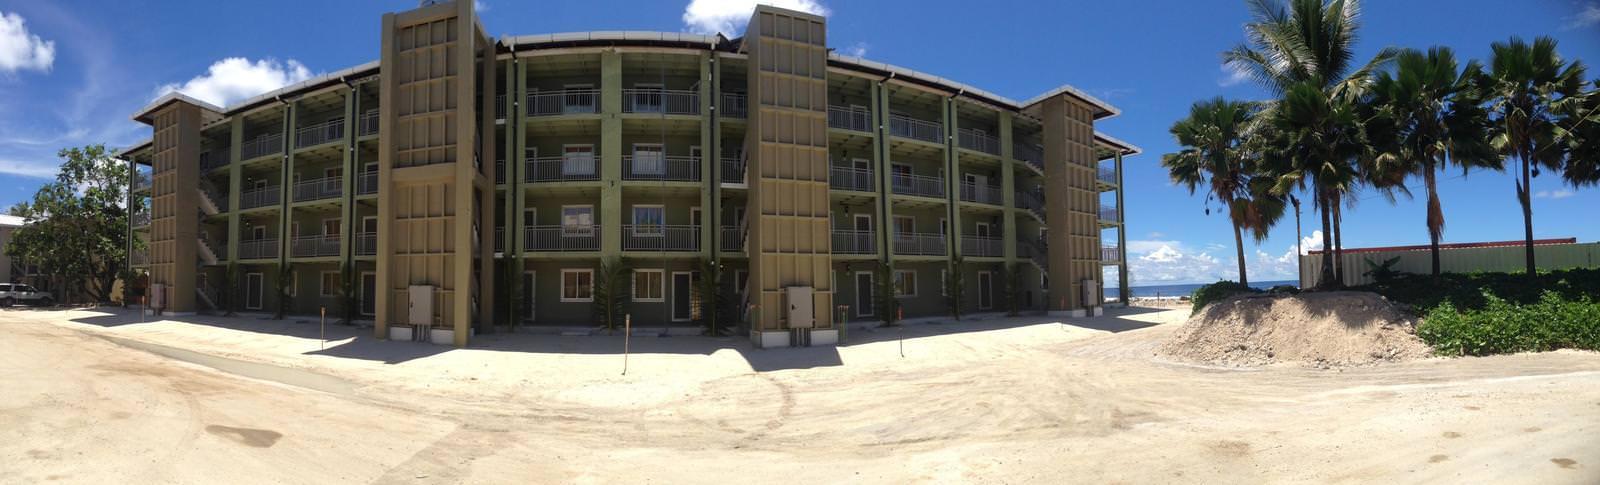 Ultimate List of Best Luxury Hotels in Marshall Islands Ajeltake Lojkar & Majuro Apartels